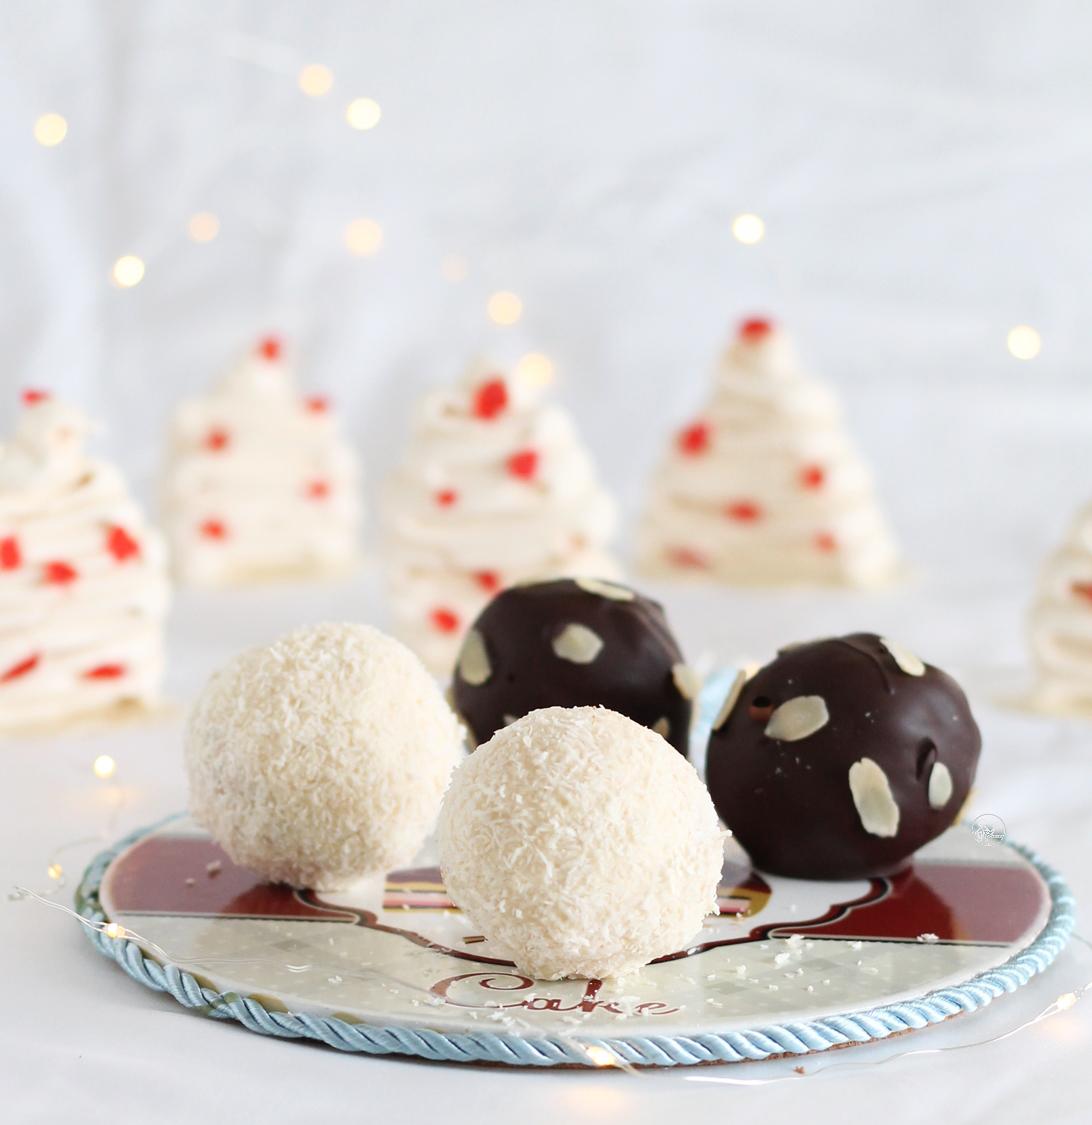 Palle di Natale di meringa senza glutine - La Cassata Celiaca